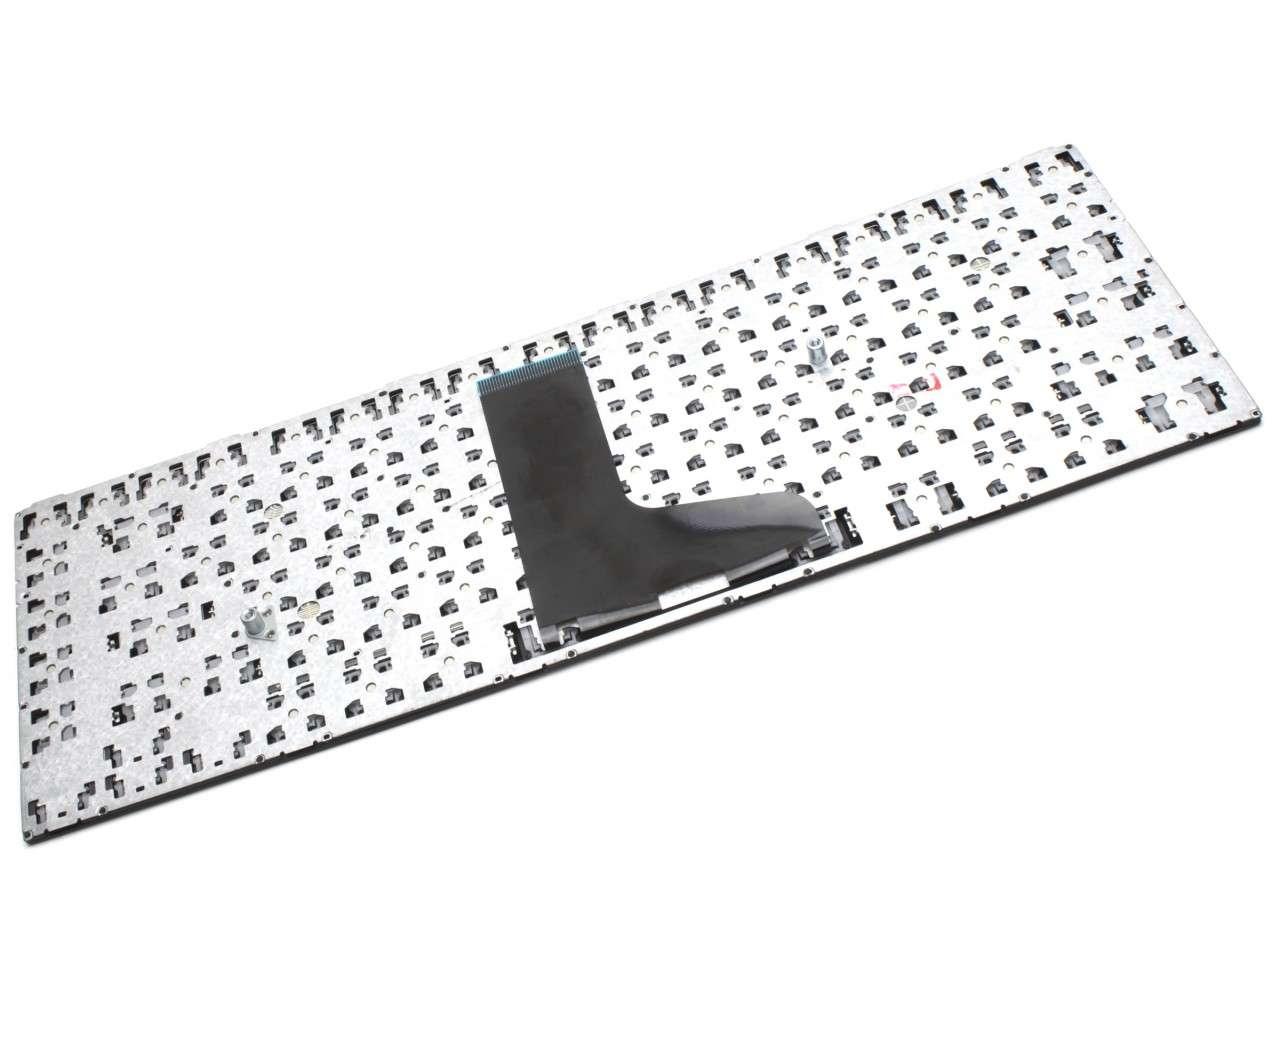 Tastatura Toshiba Satellite L40DT A imagine powerlaptop.ro 2021